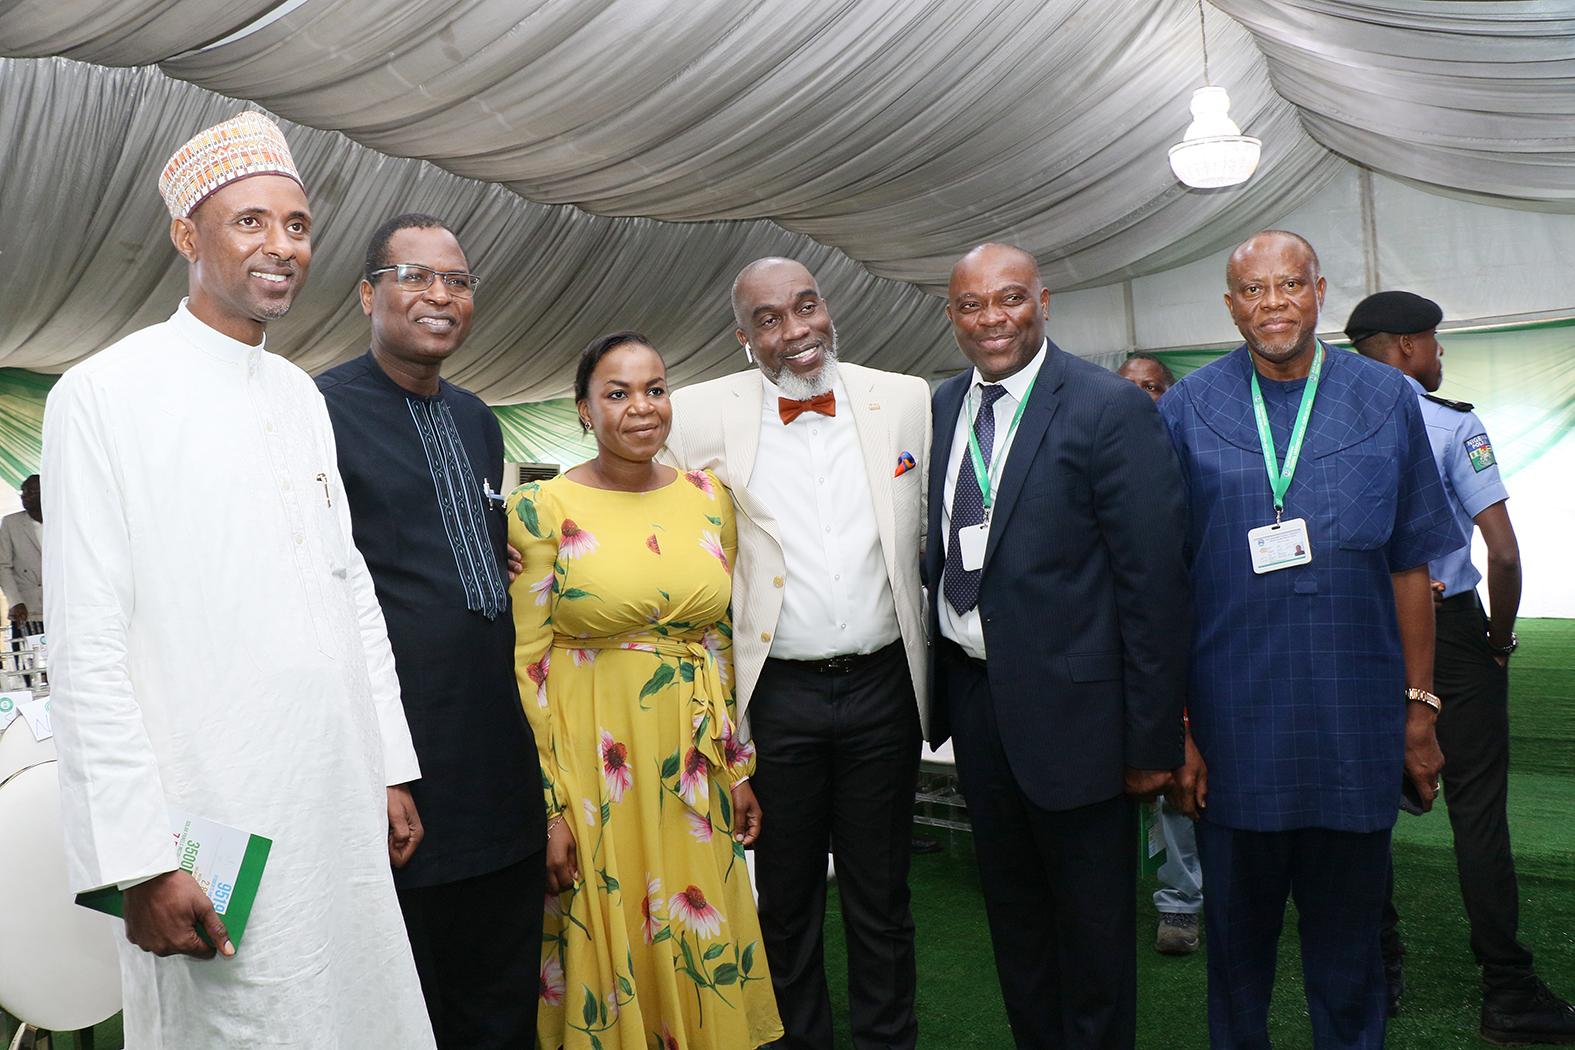 Commissioning of Solar Hybrid Project at Alex Ekwueme Federal University Dufu –Alike Ikwo, Ebonyi State by His Excellency Prof. Yemi Osinbajo ,Vice President Federal Republic of Nigeria